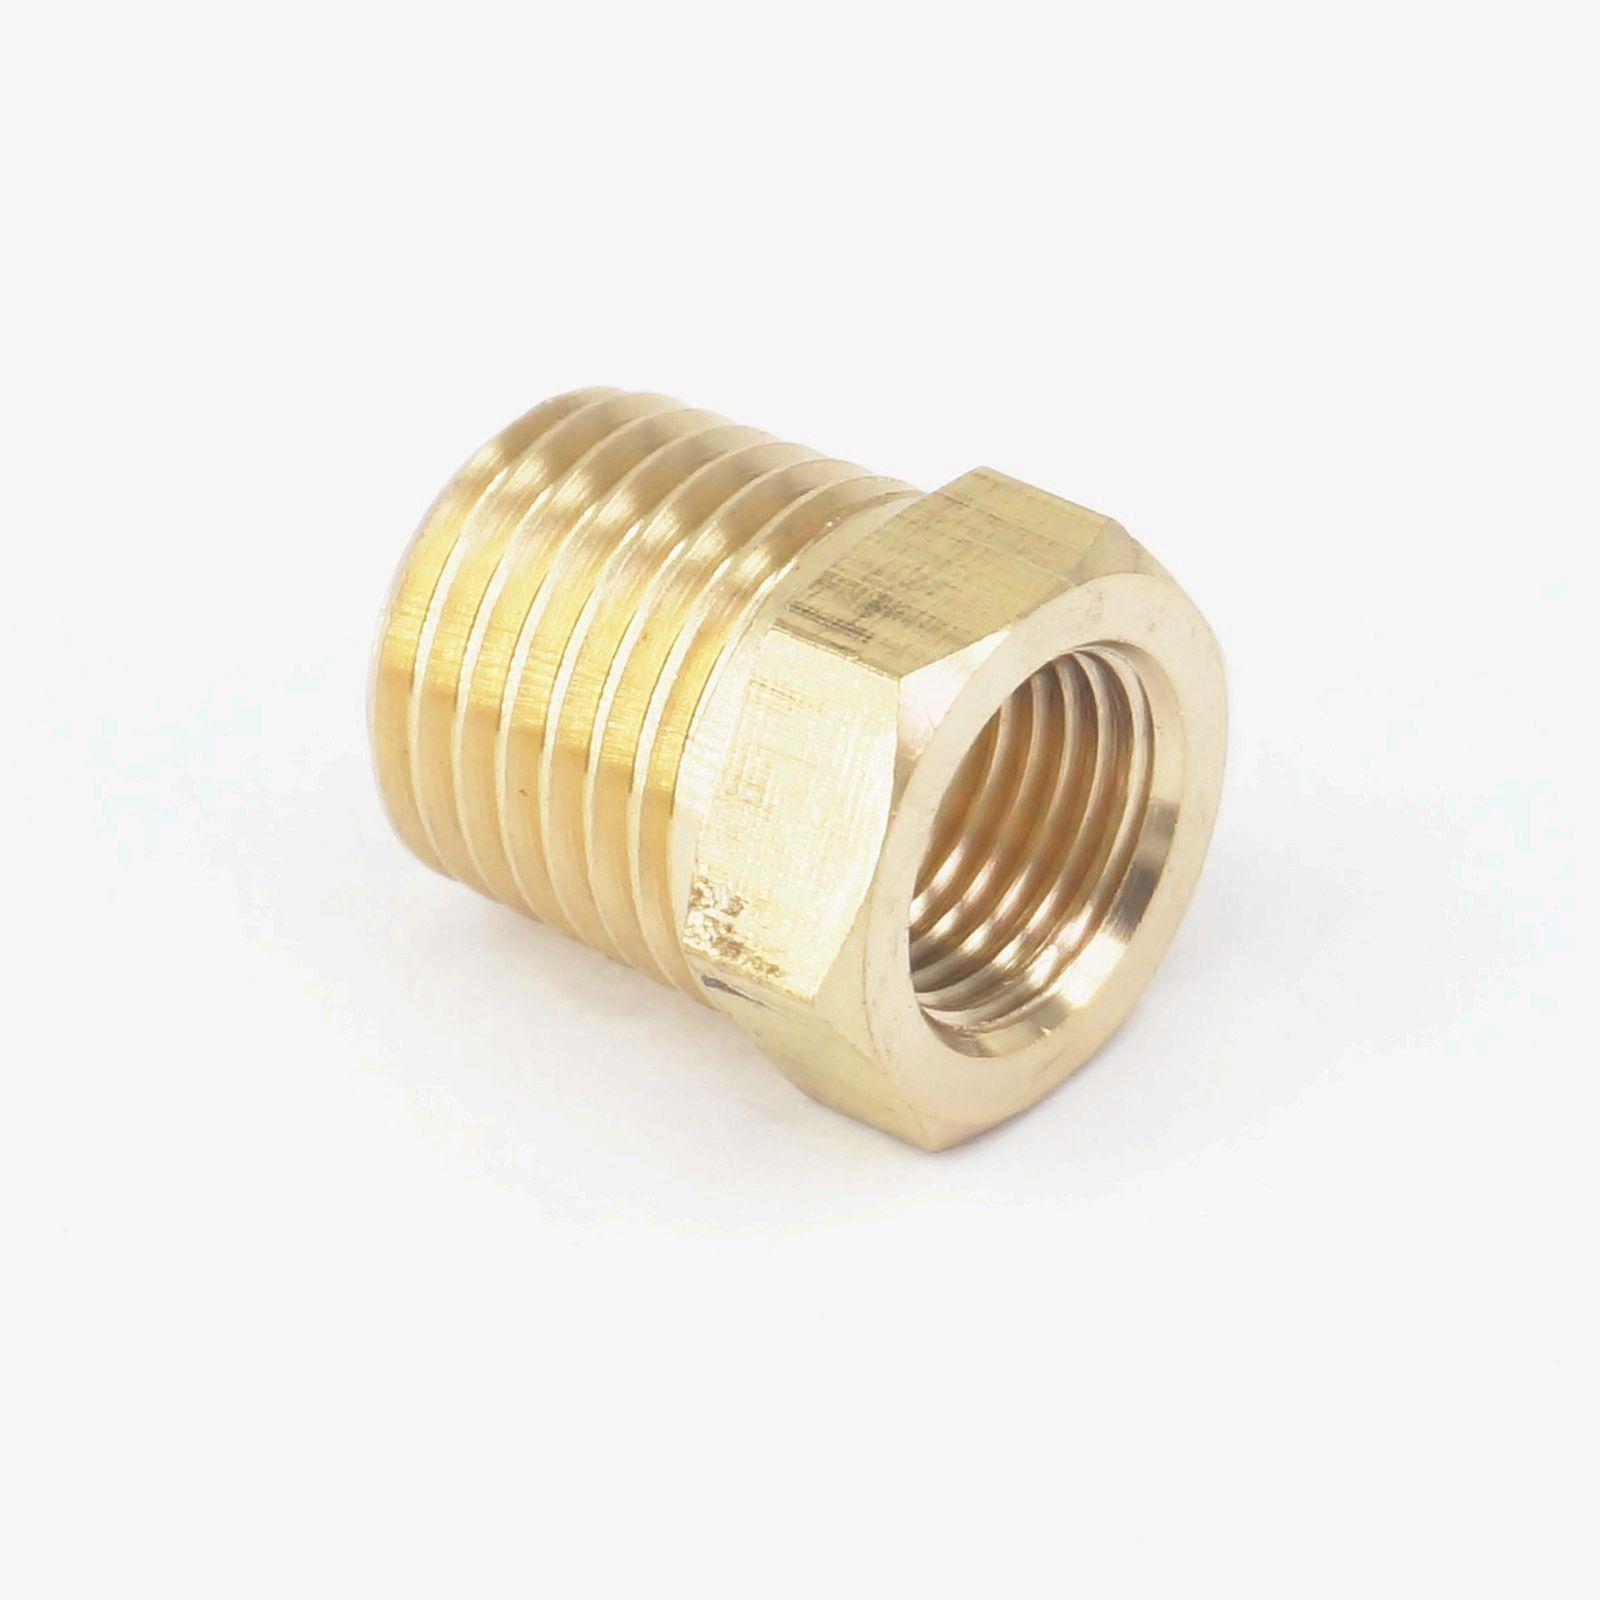 HSeng 1//8/'/' BSP Male to 1//4/'/' BSP Female Air Compressor Adaptor